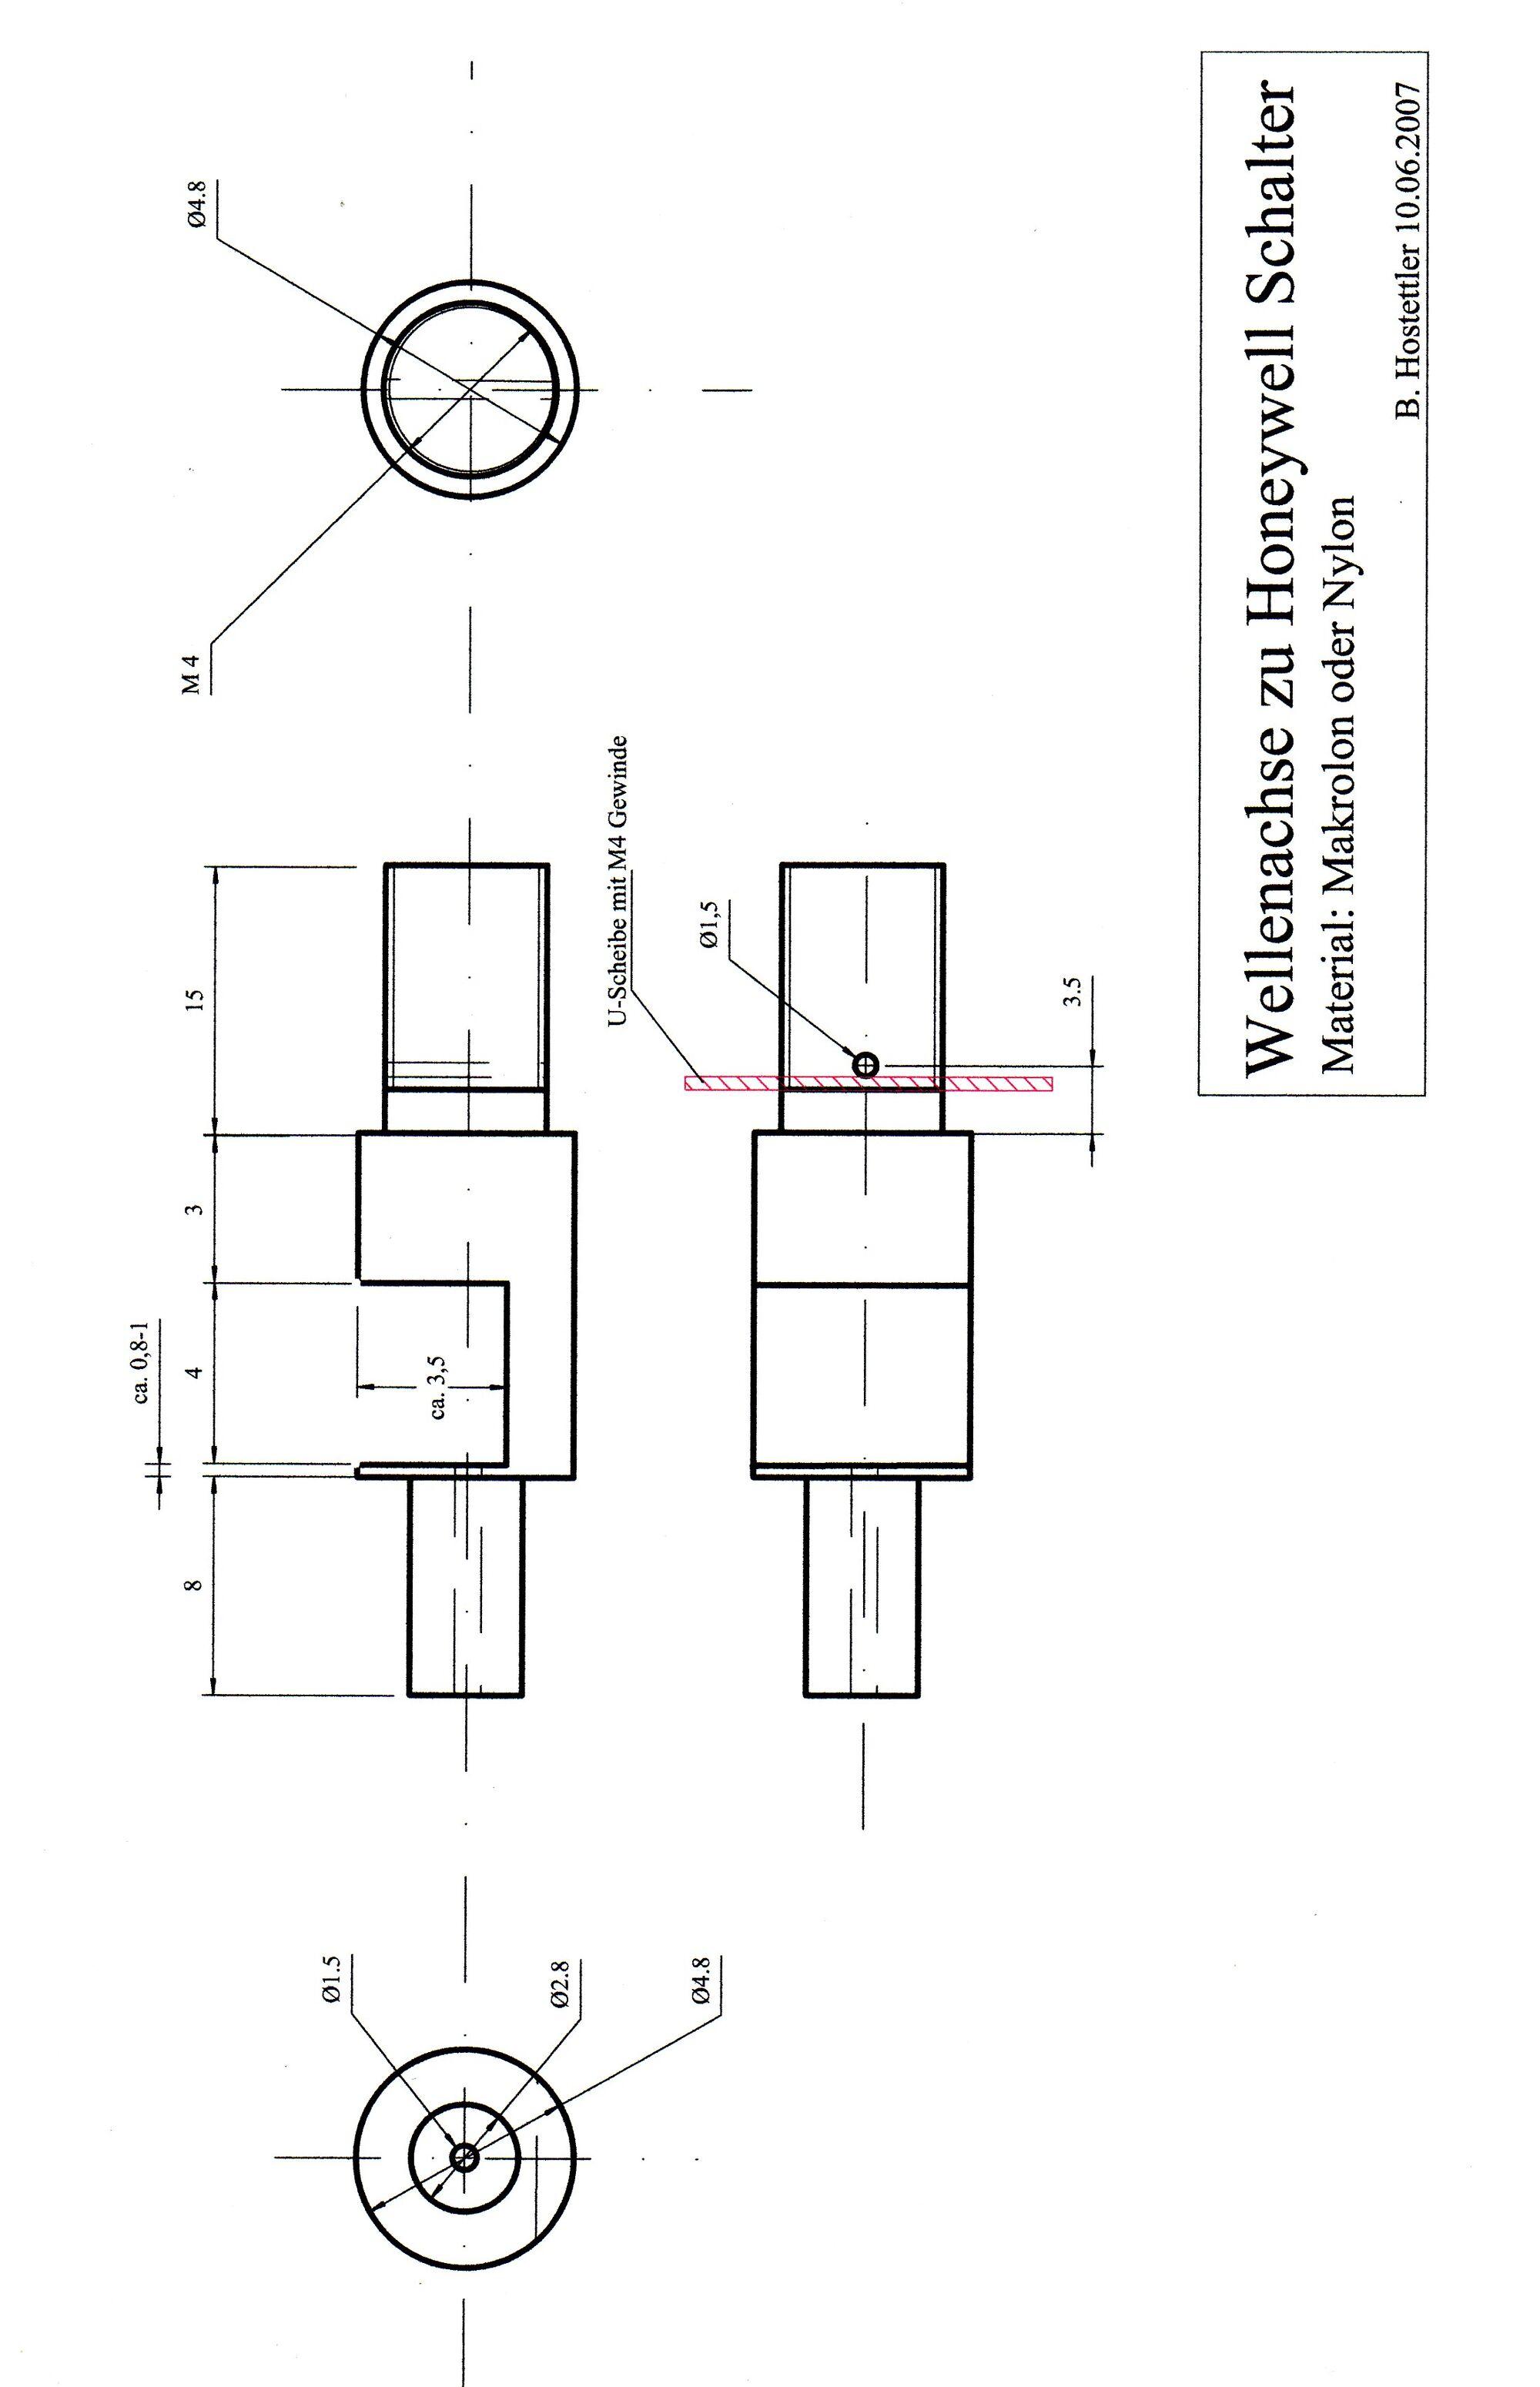 wurlitzer 1700 tonarmendschalter jukebox wiki fandom powered by wikia. Black Bedroom Furniture Sets. Home Design Ideas